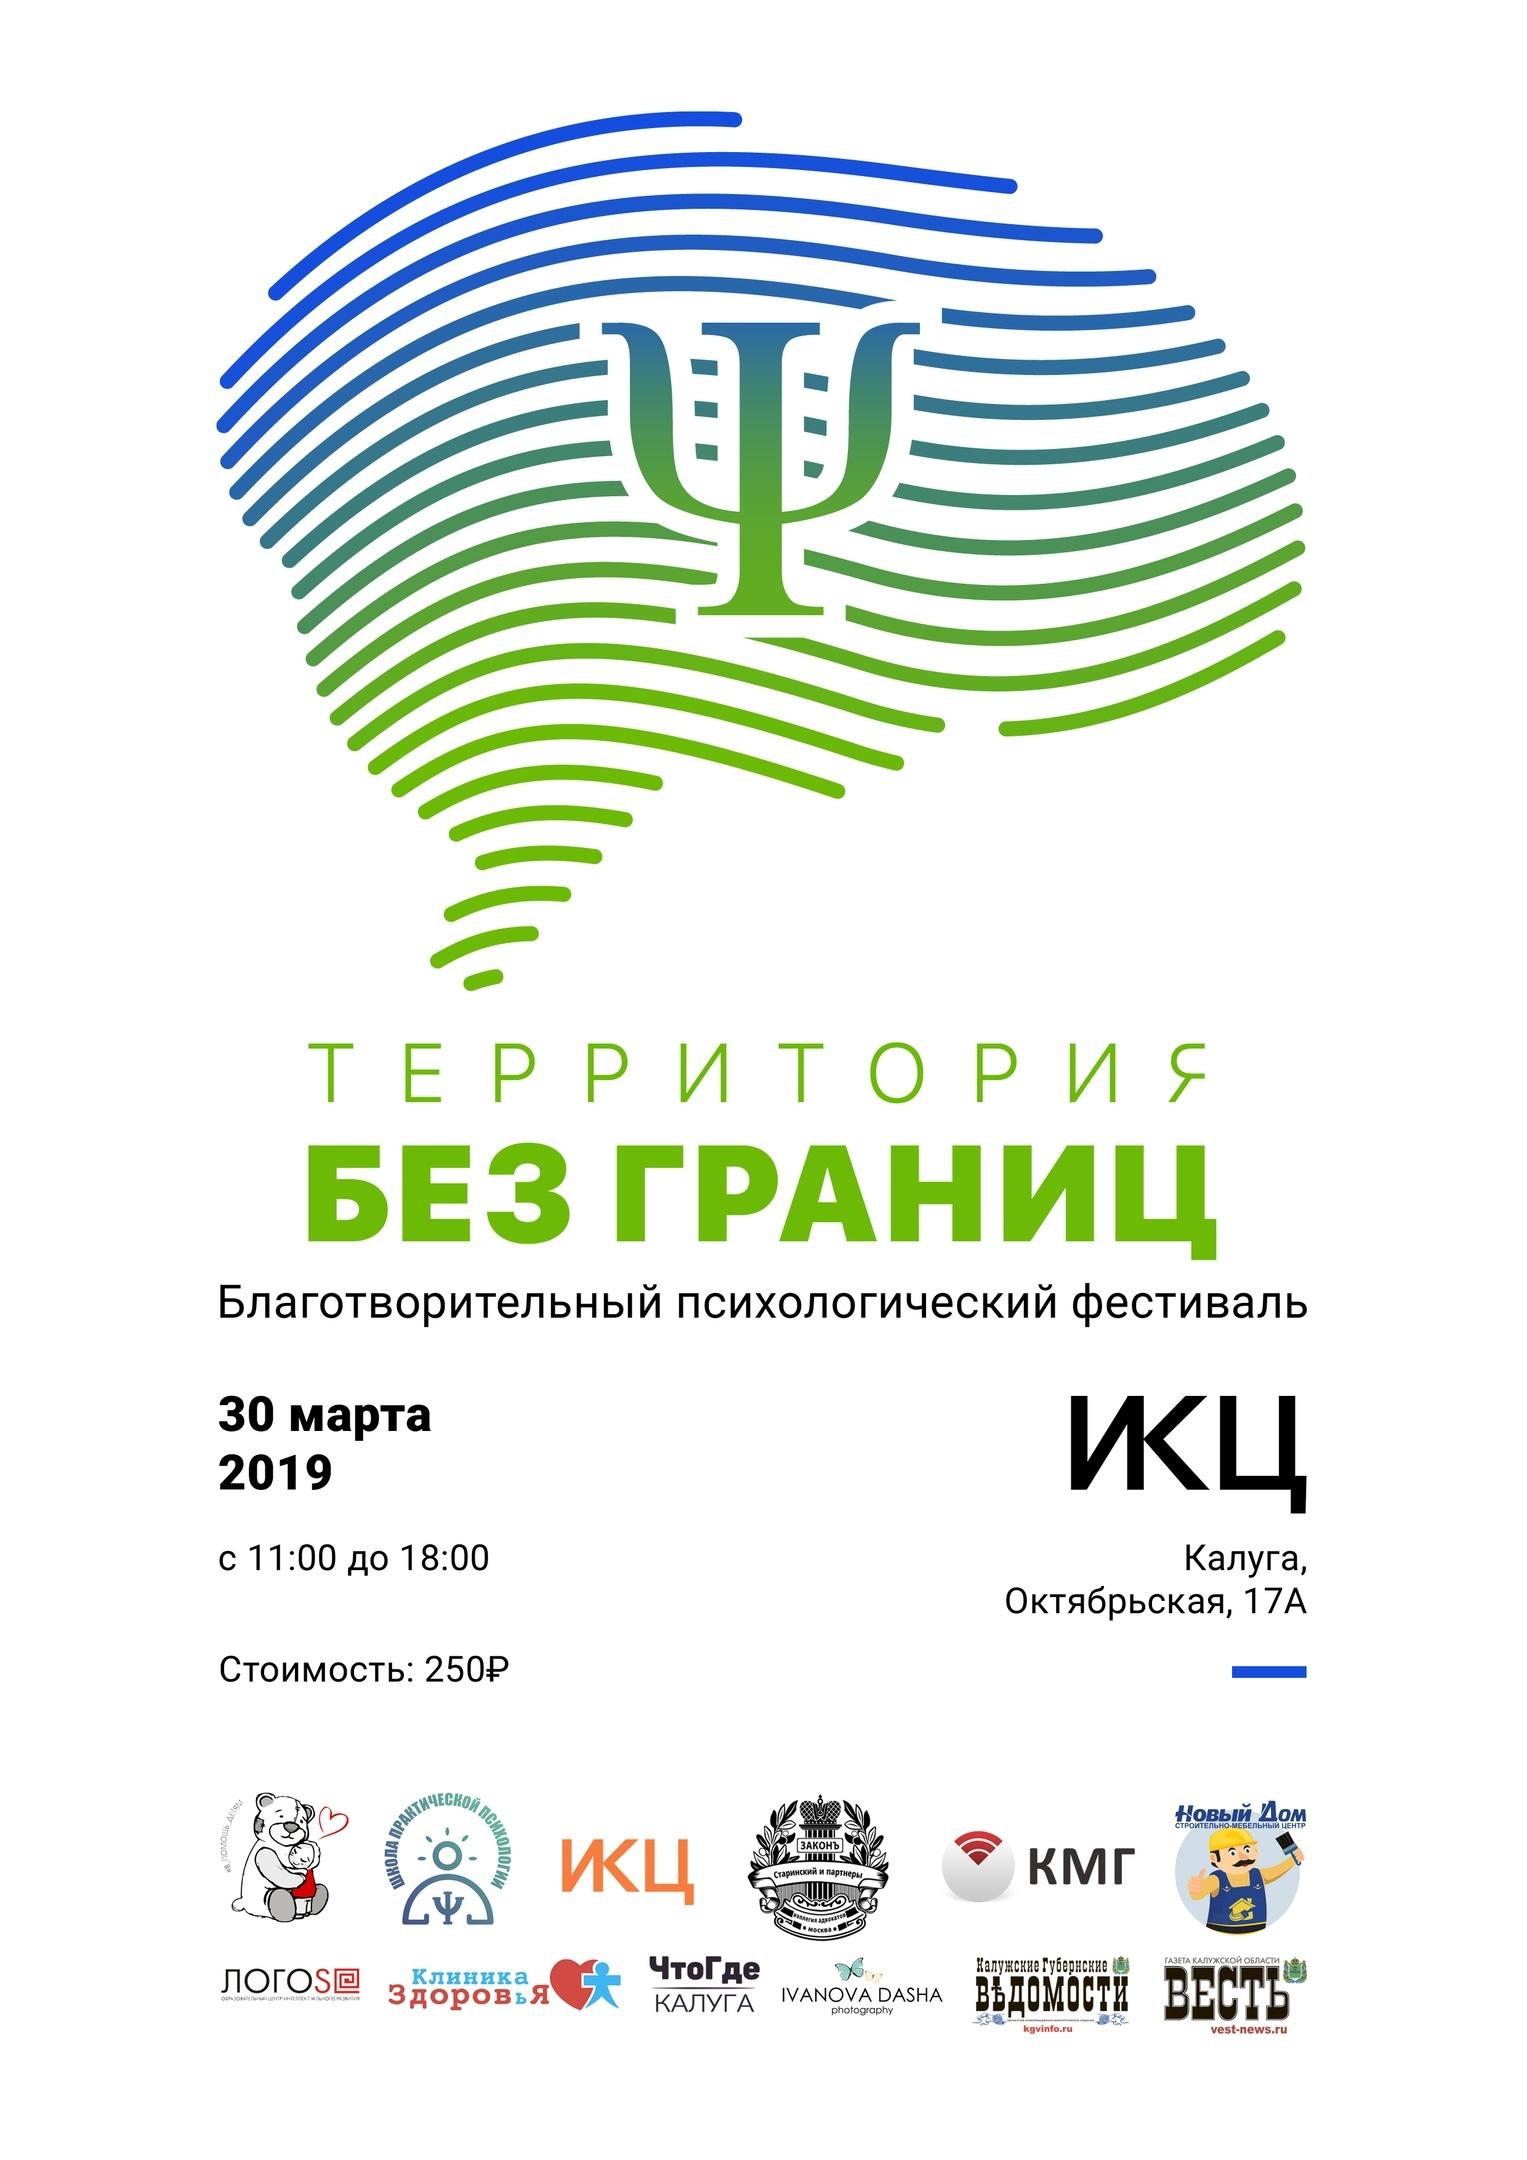 festival-territoriya-bez-granic